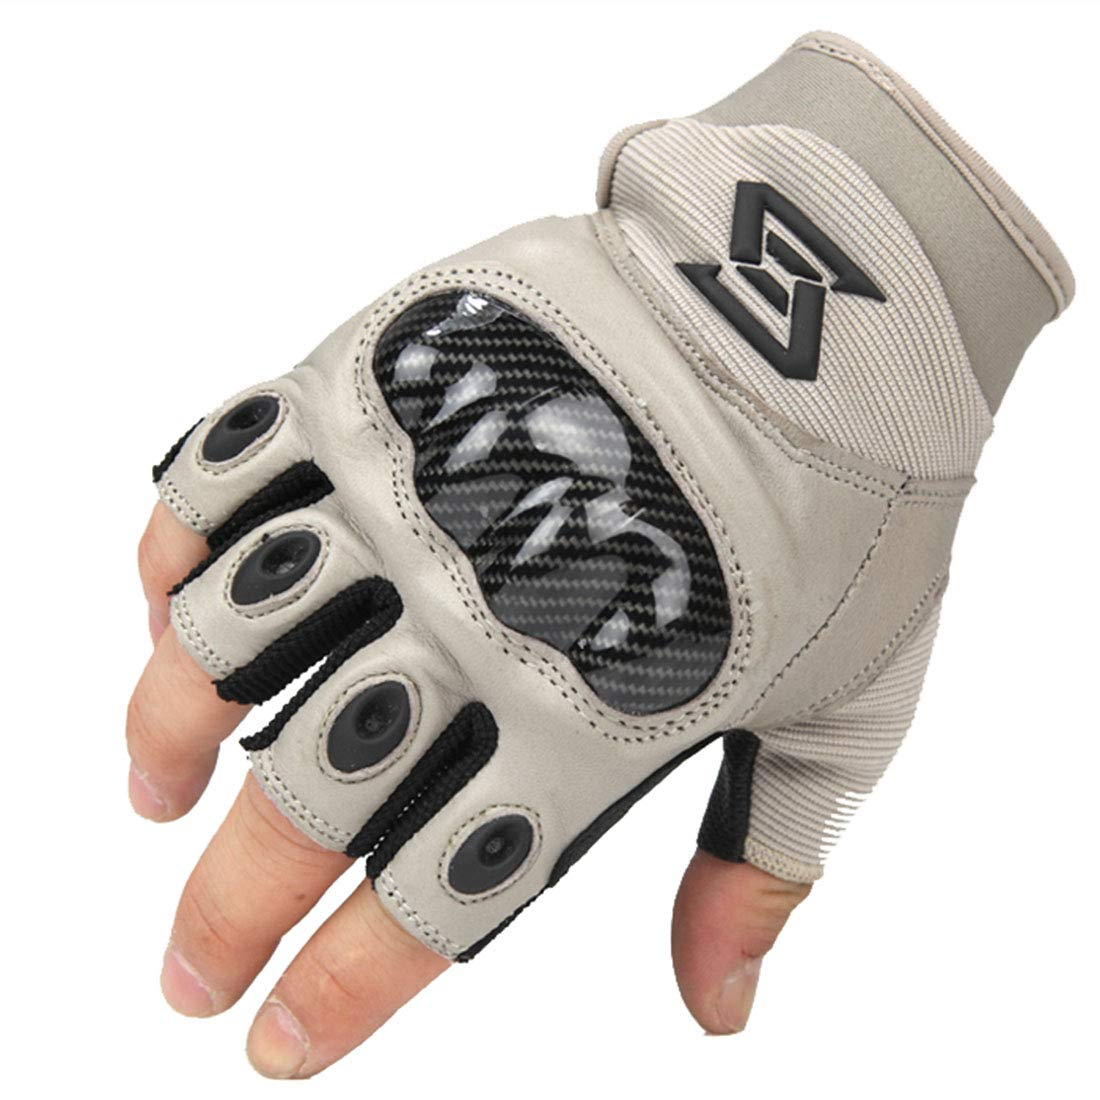 JESSIEKERVIN YY3 Leder Rüstung Taktische Halbfinger Handschuhe Kohlefaser äußere Schutzhandschuhe Ausbildung Rutschfeste Handschuhe